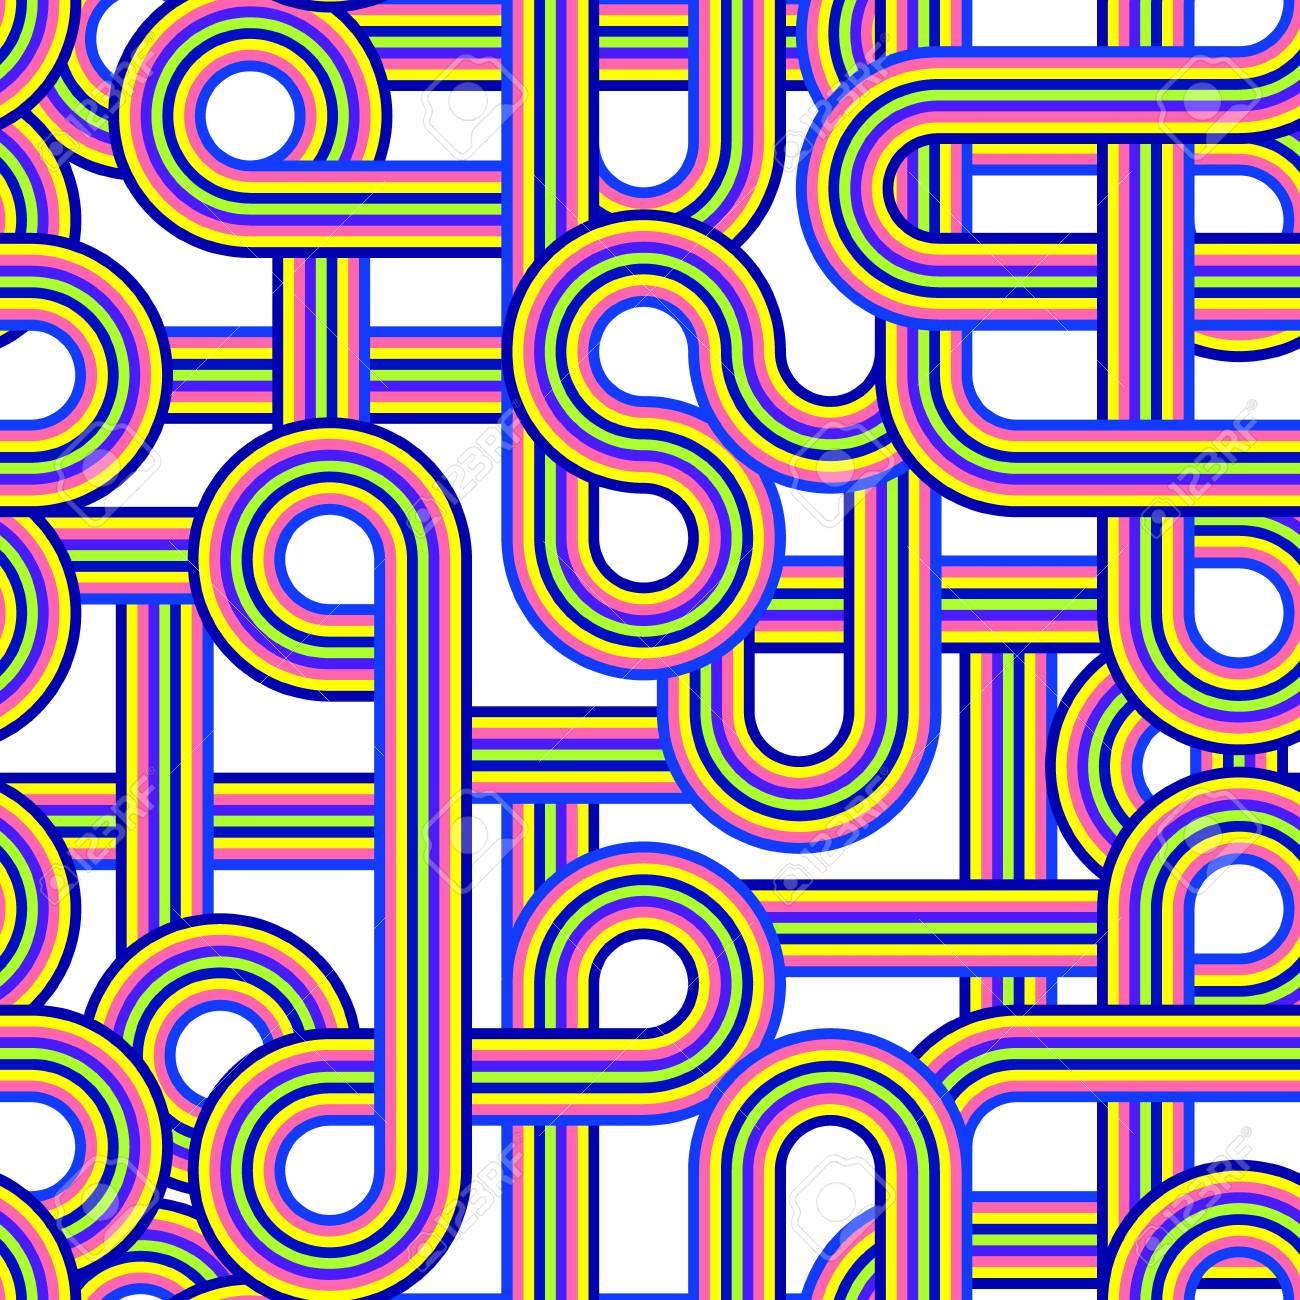 Illustration of abstract sramless pattern Stock Vector - 14701061